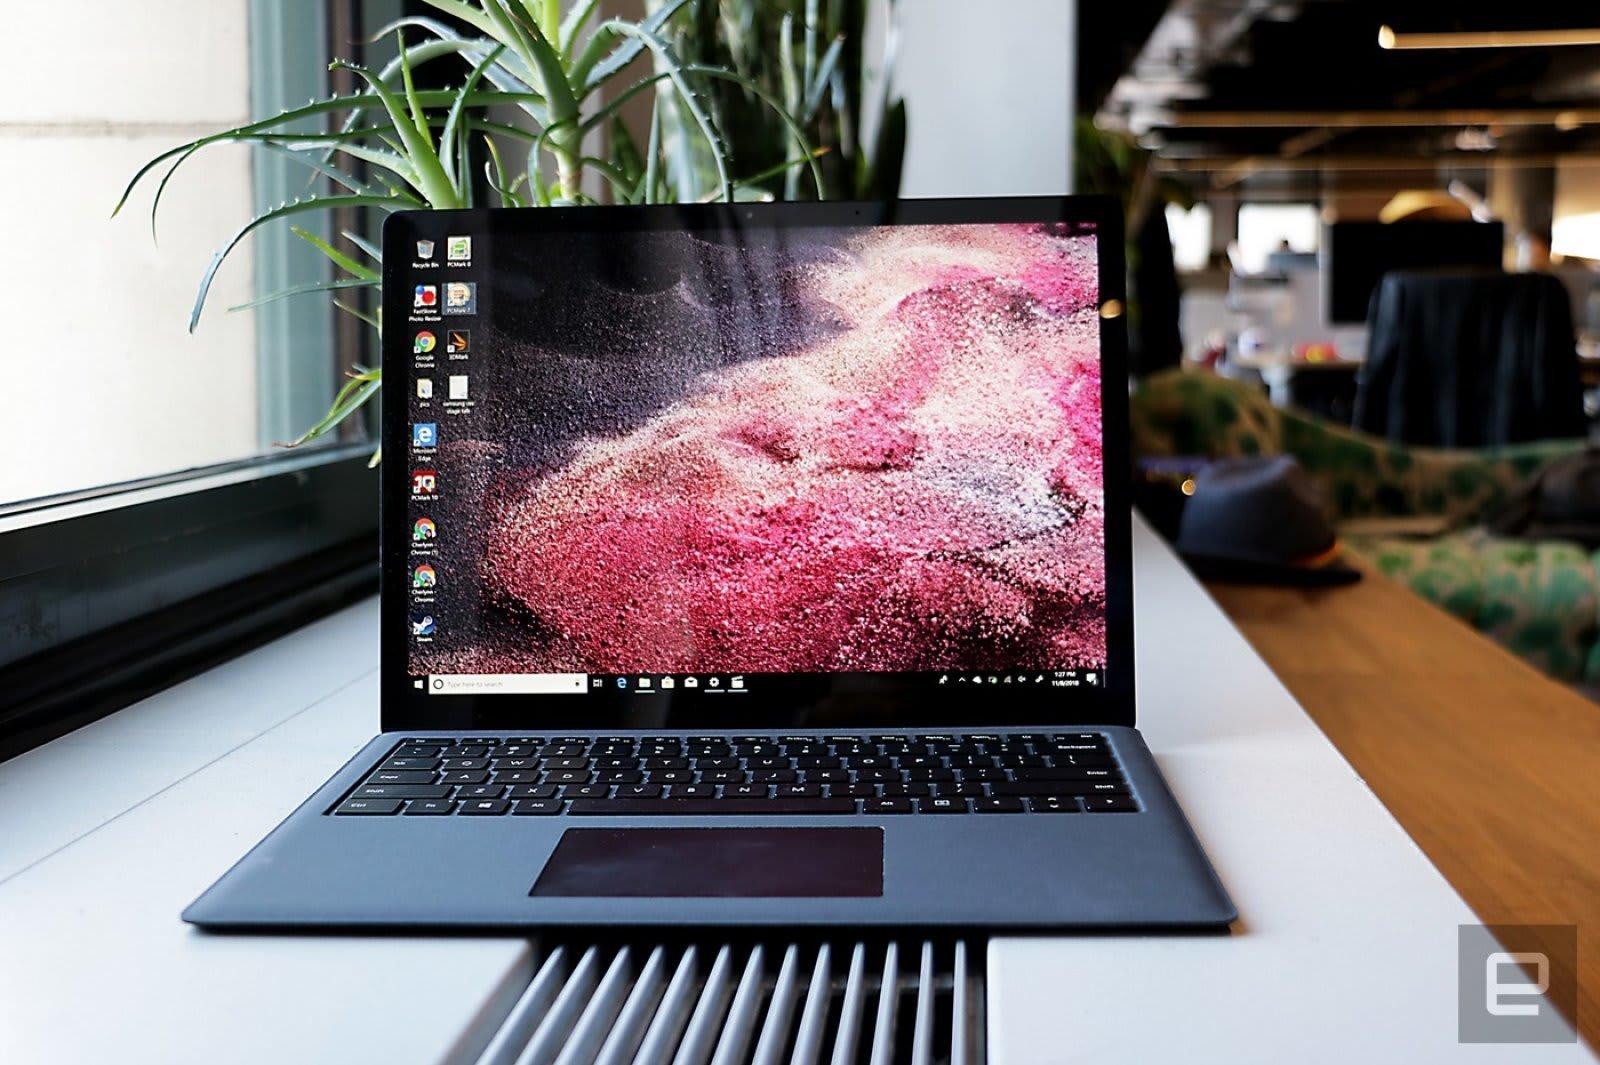 Windows 10 AI Assistant